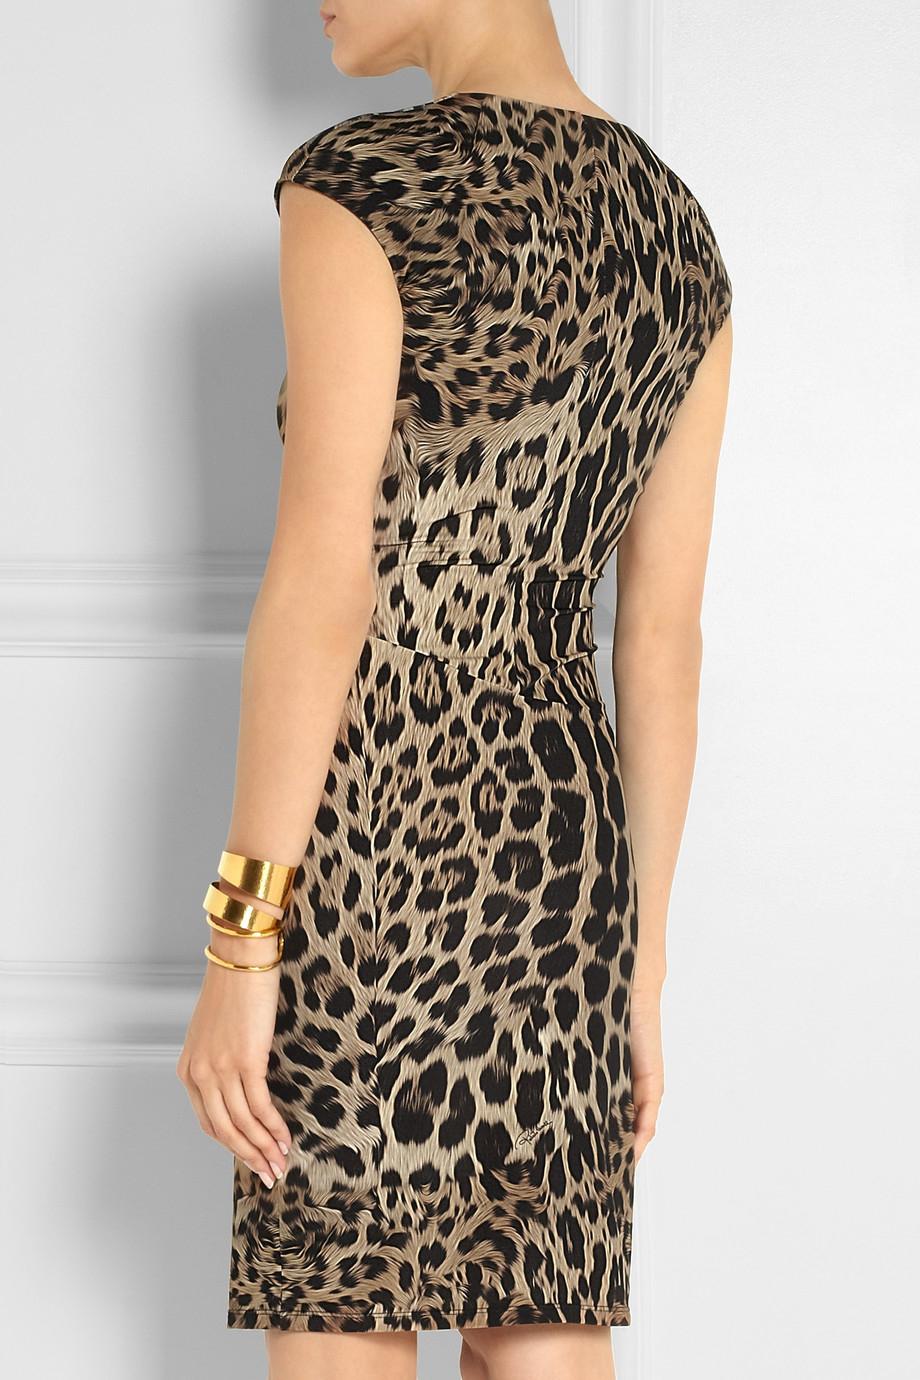 01540a134c3a3 Roberto Cavalli Leopard-Print Stretch-Jersey Dress - Lyst